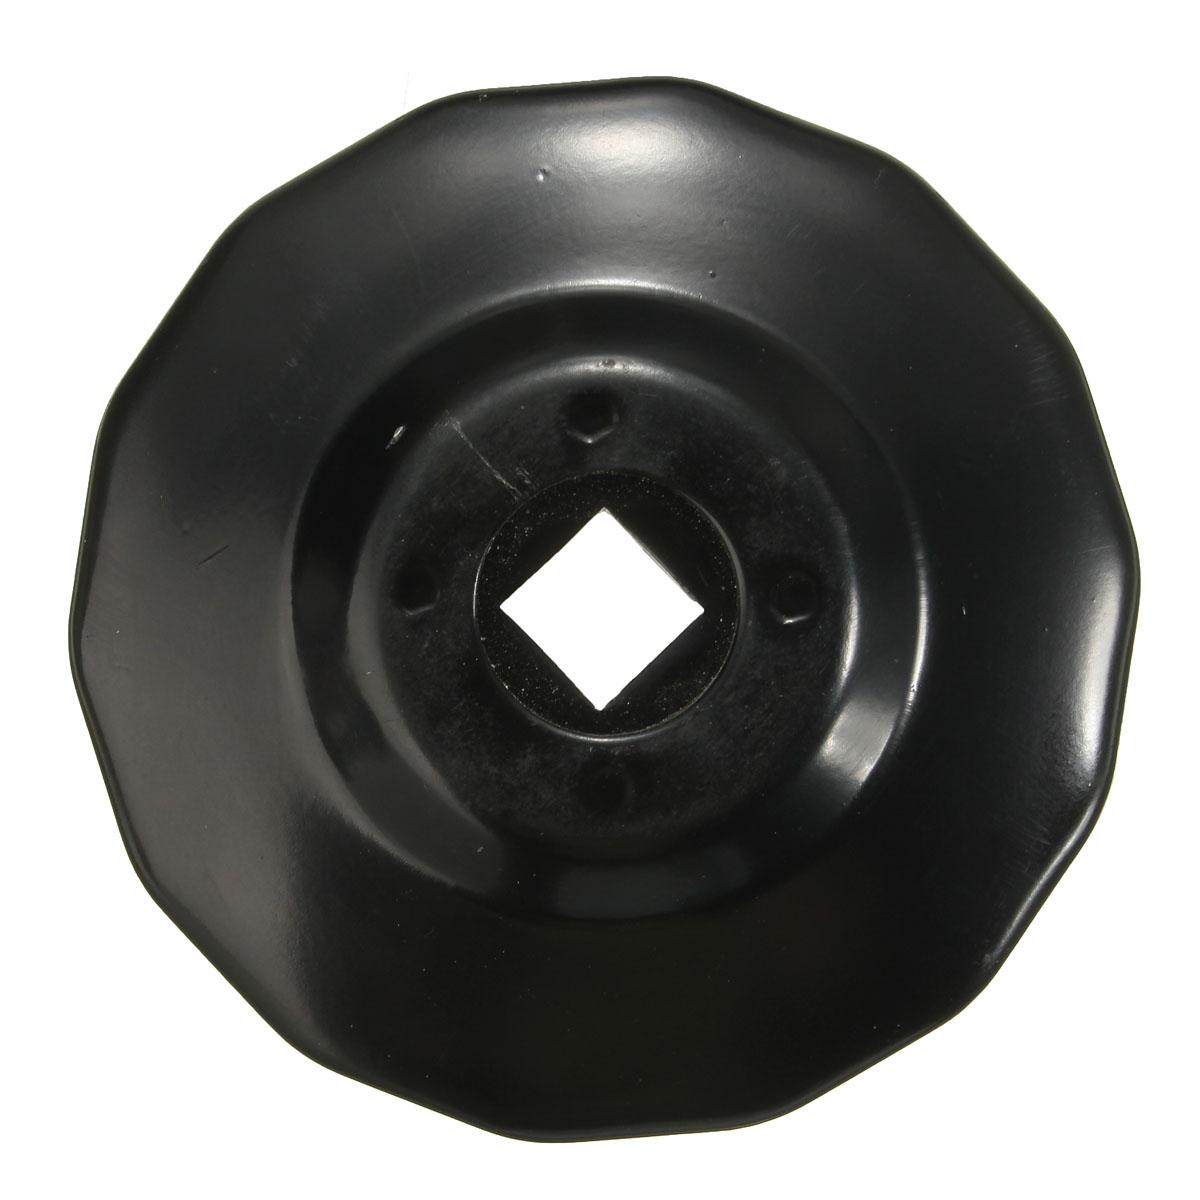 Mercedes benz oil filter tool mercedes free engine image for Mercedes benz oil filter cap wrench